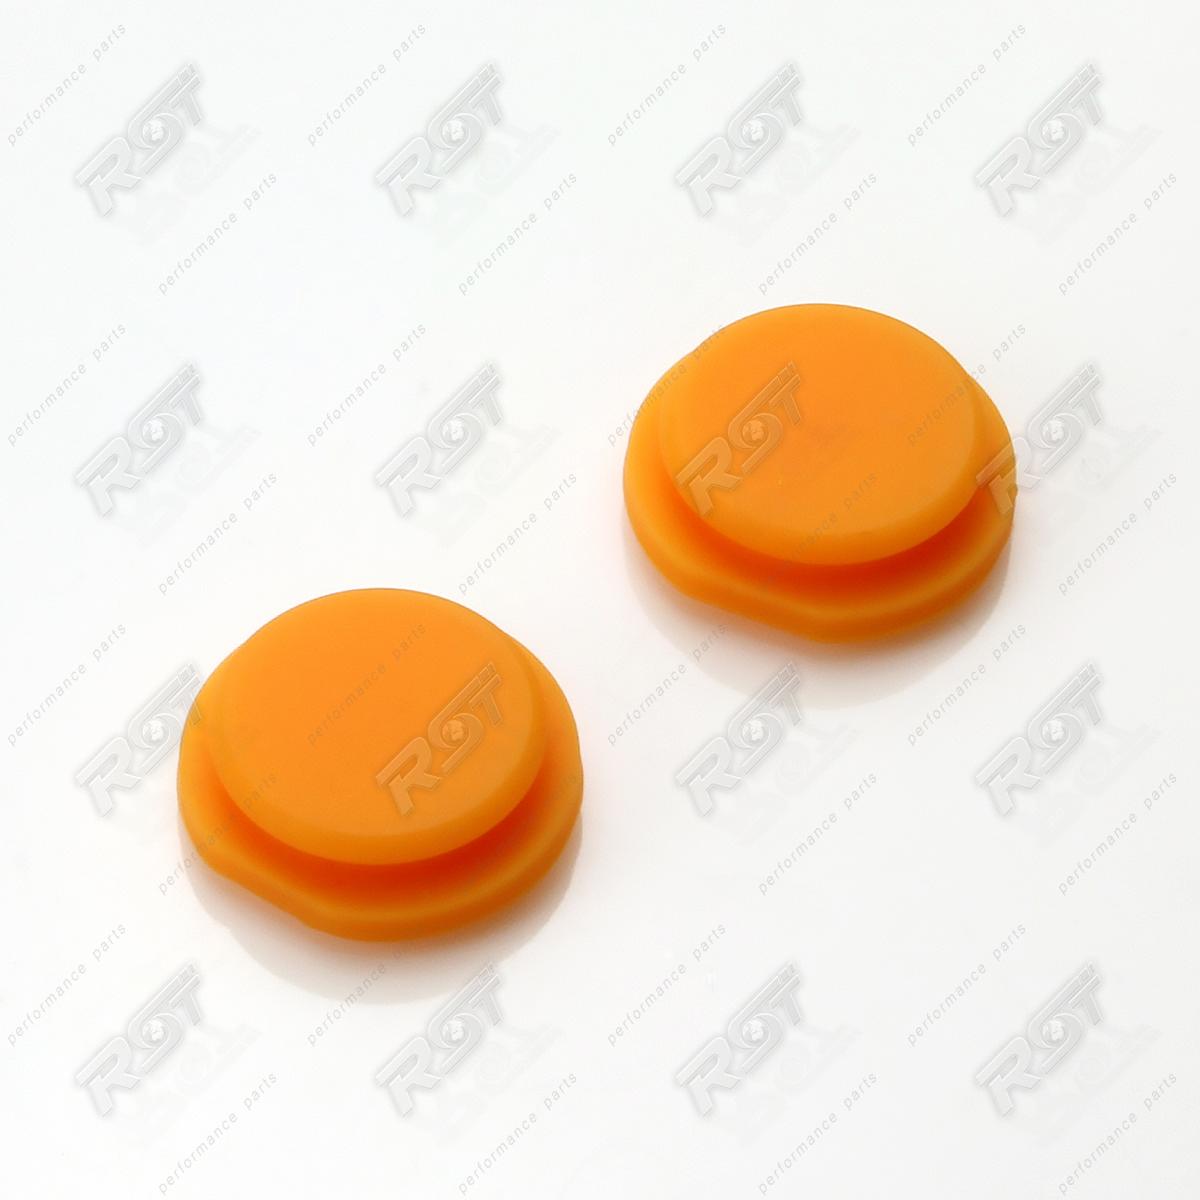 schl ssel tasten tastenfeld druckknopf gummi pad f r smart. Black Bedroom Furniture Sets. Home Design Ideas